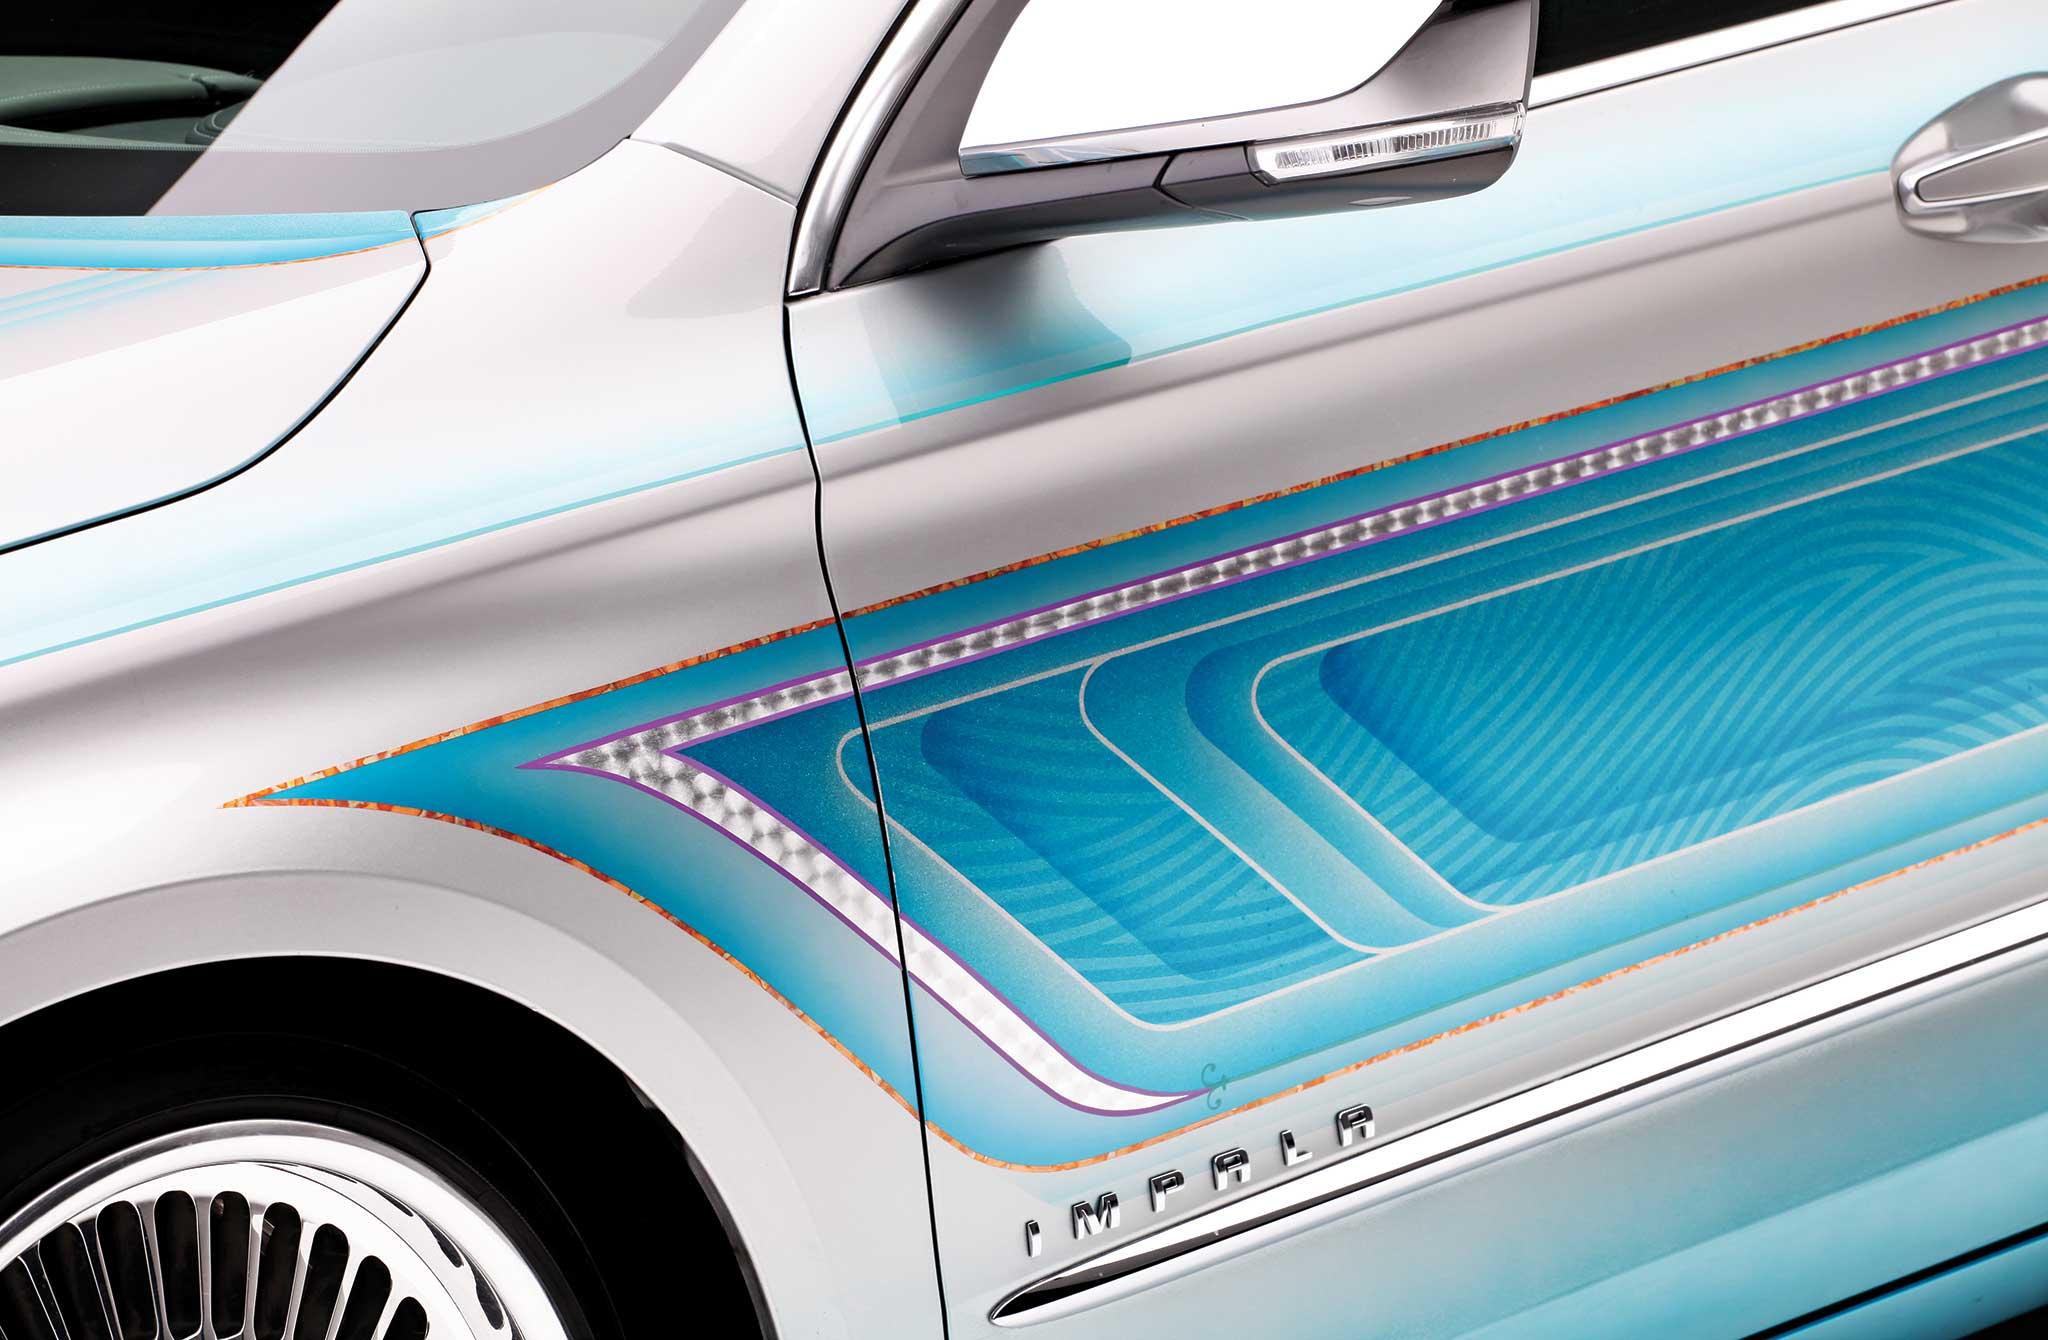 013 2014 chevrolet impala custom door graphics